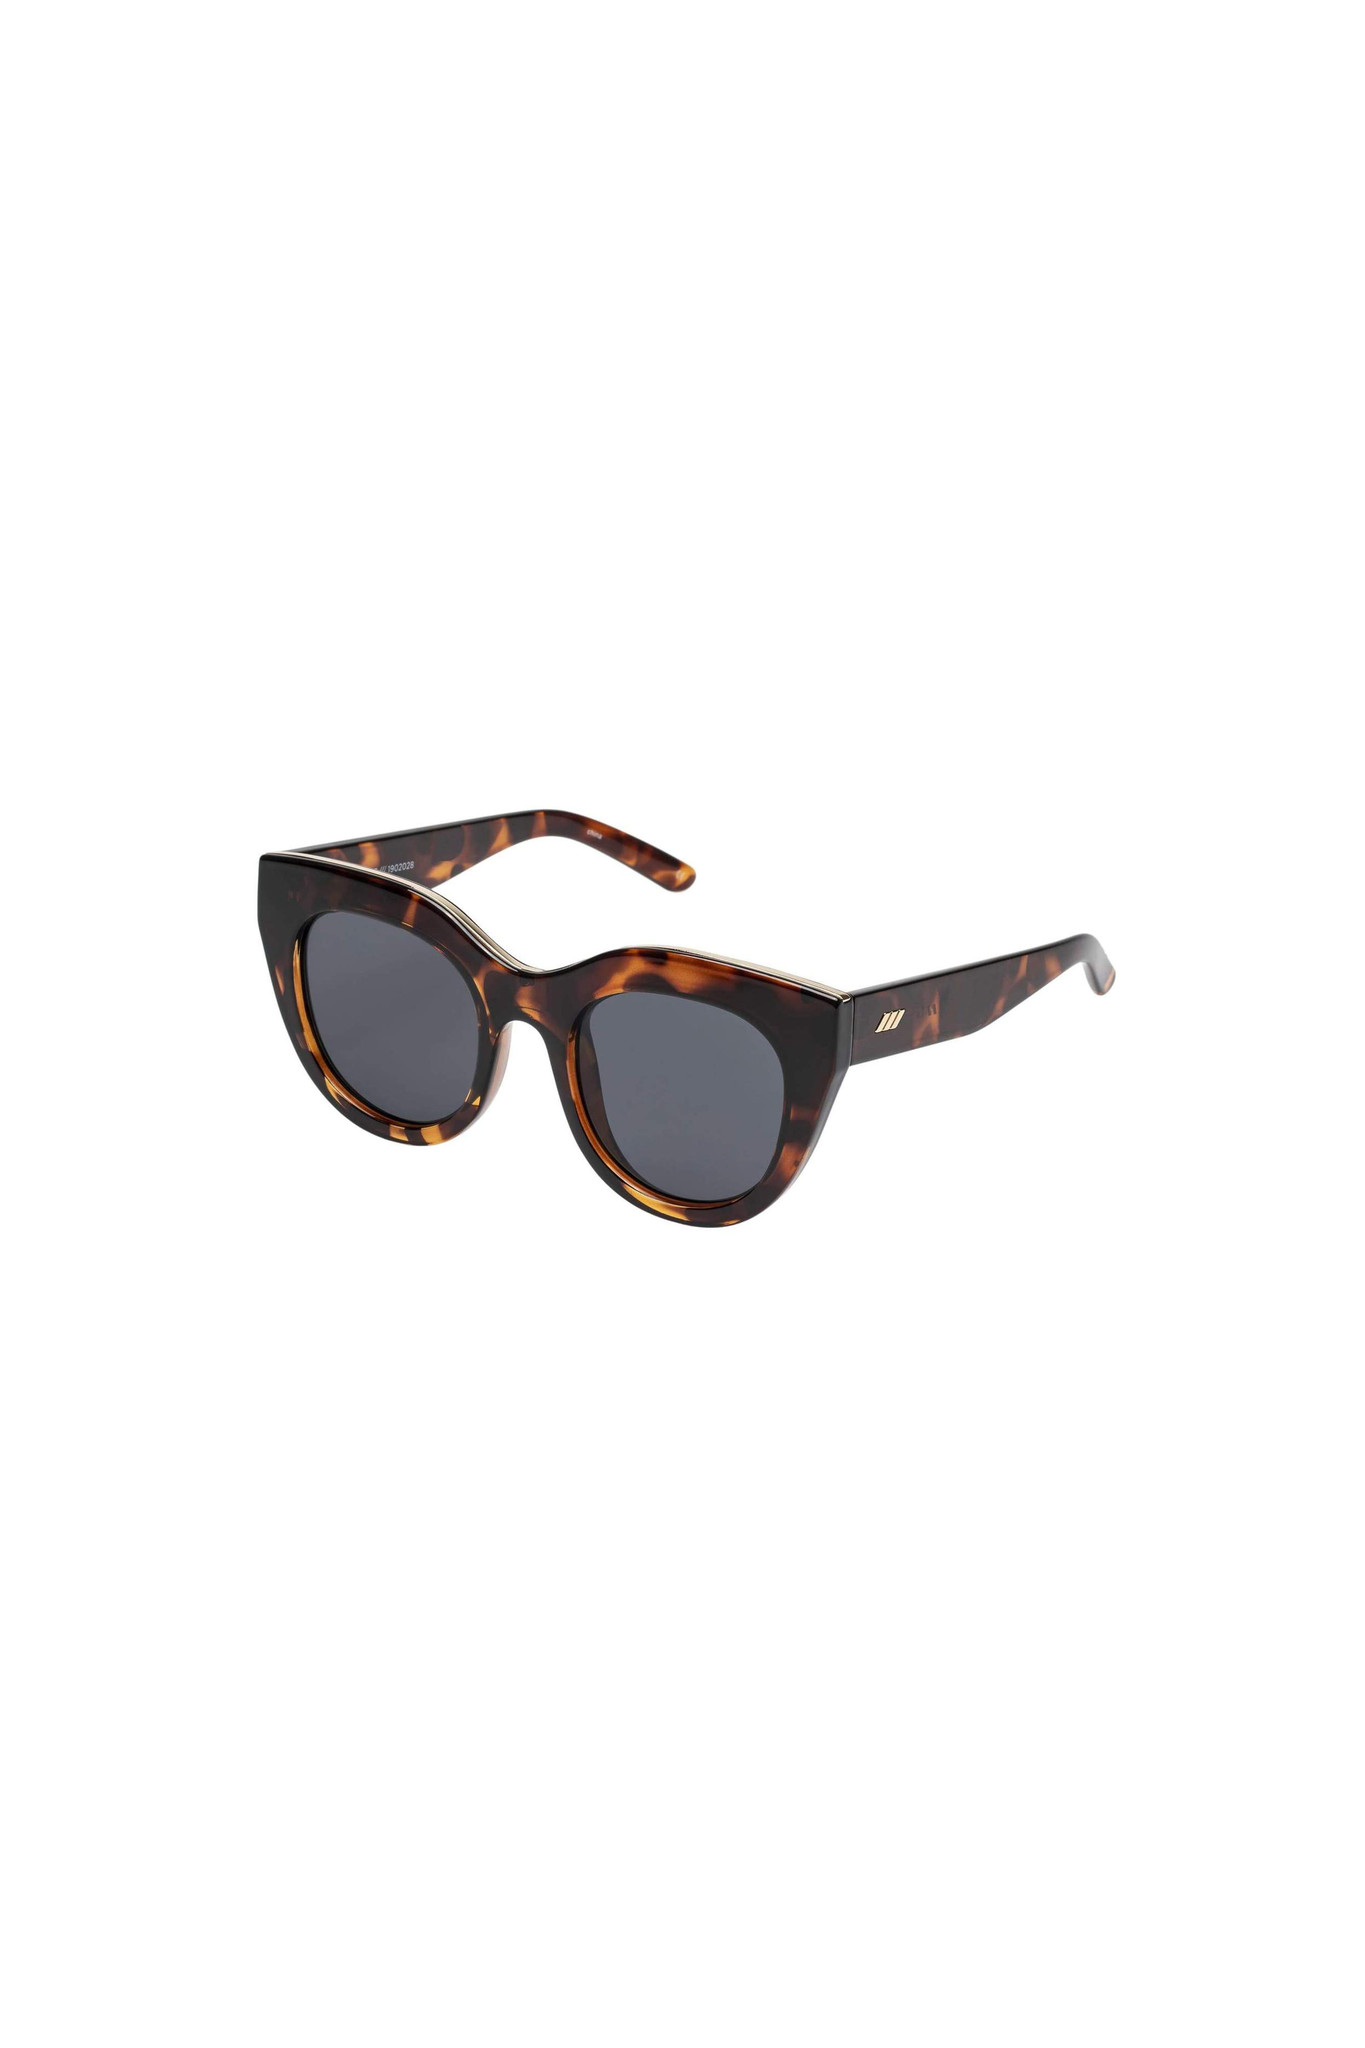 Air Heart Sunglasses - Tortoise-3